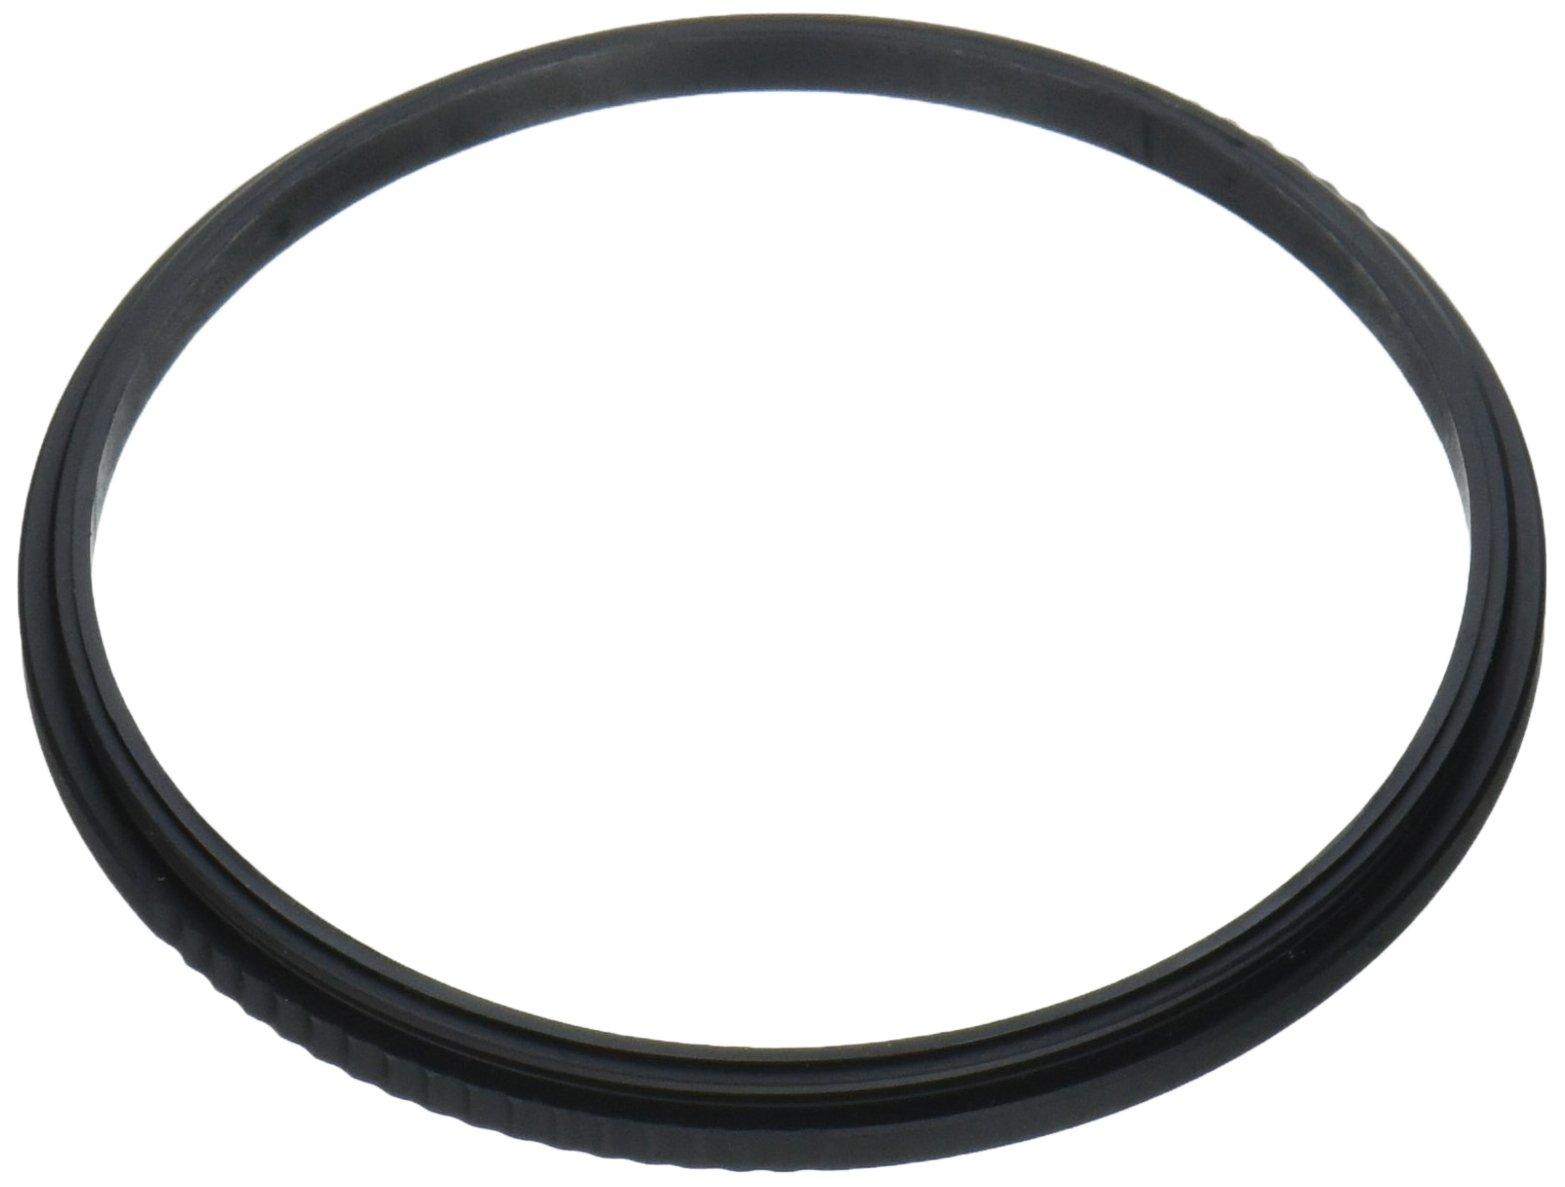 Xume MFXLA77 Lens Adapter 77mm, Black, Compact by Xume